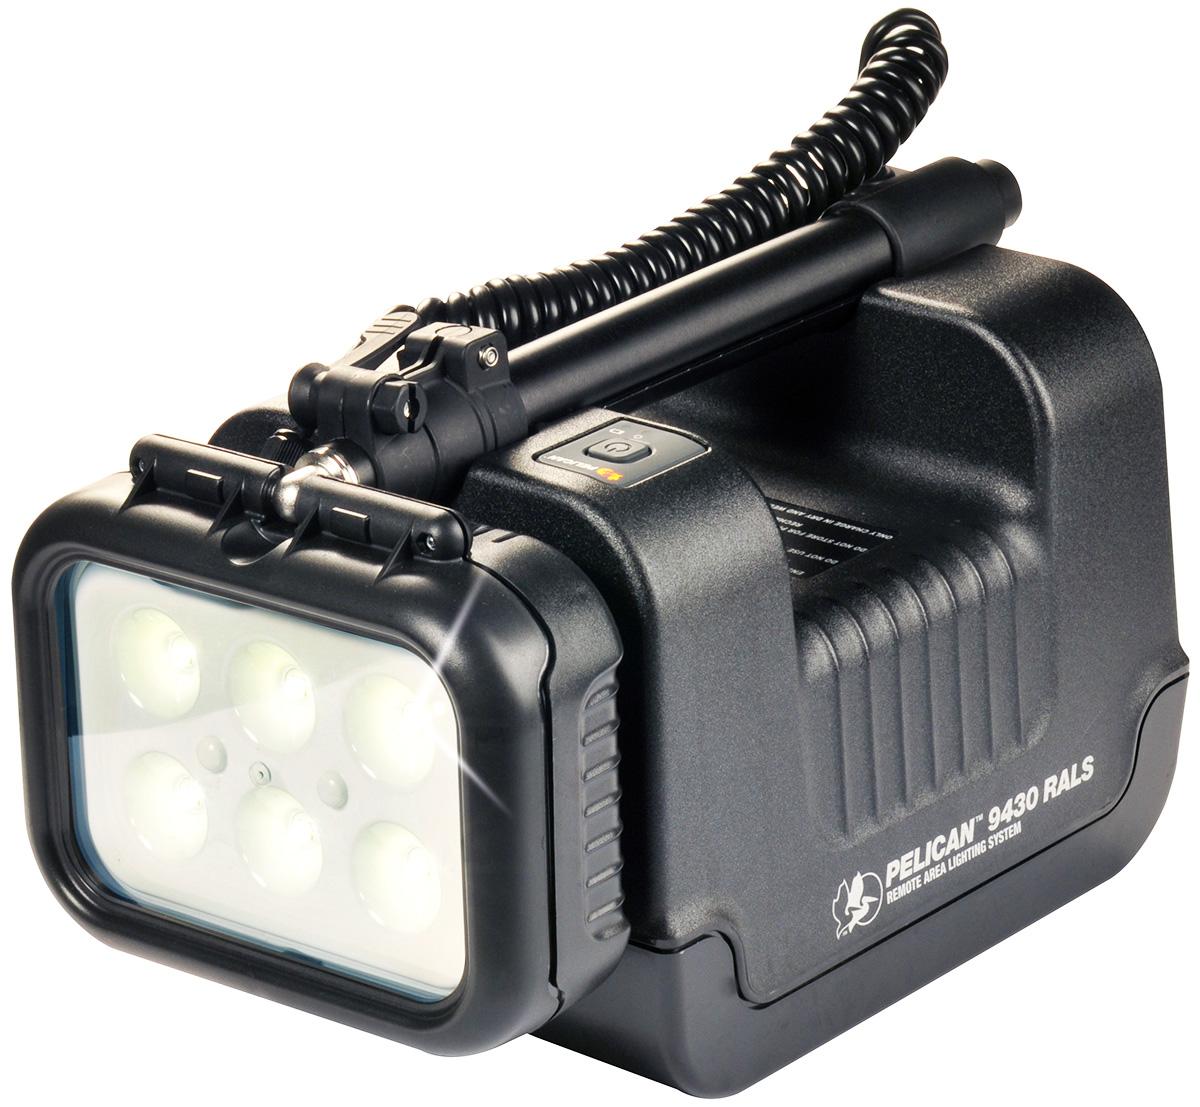 pelican portable work emergency led light